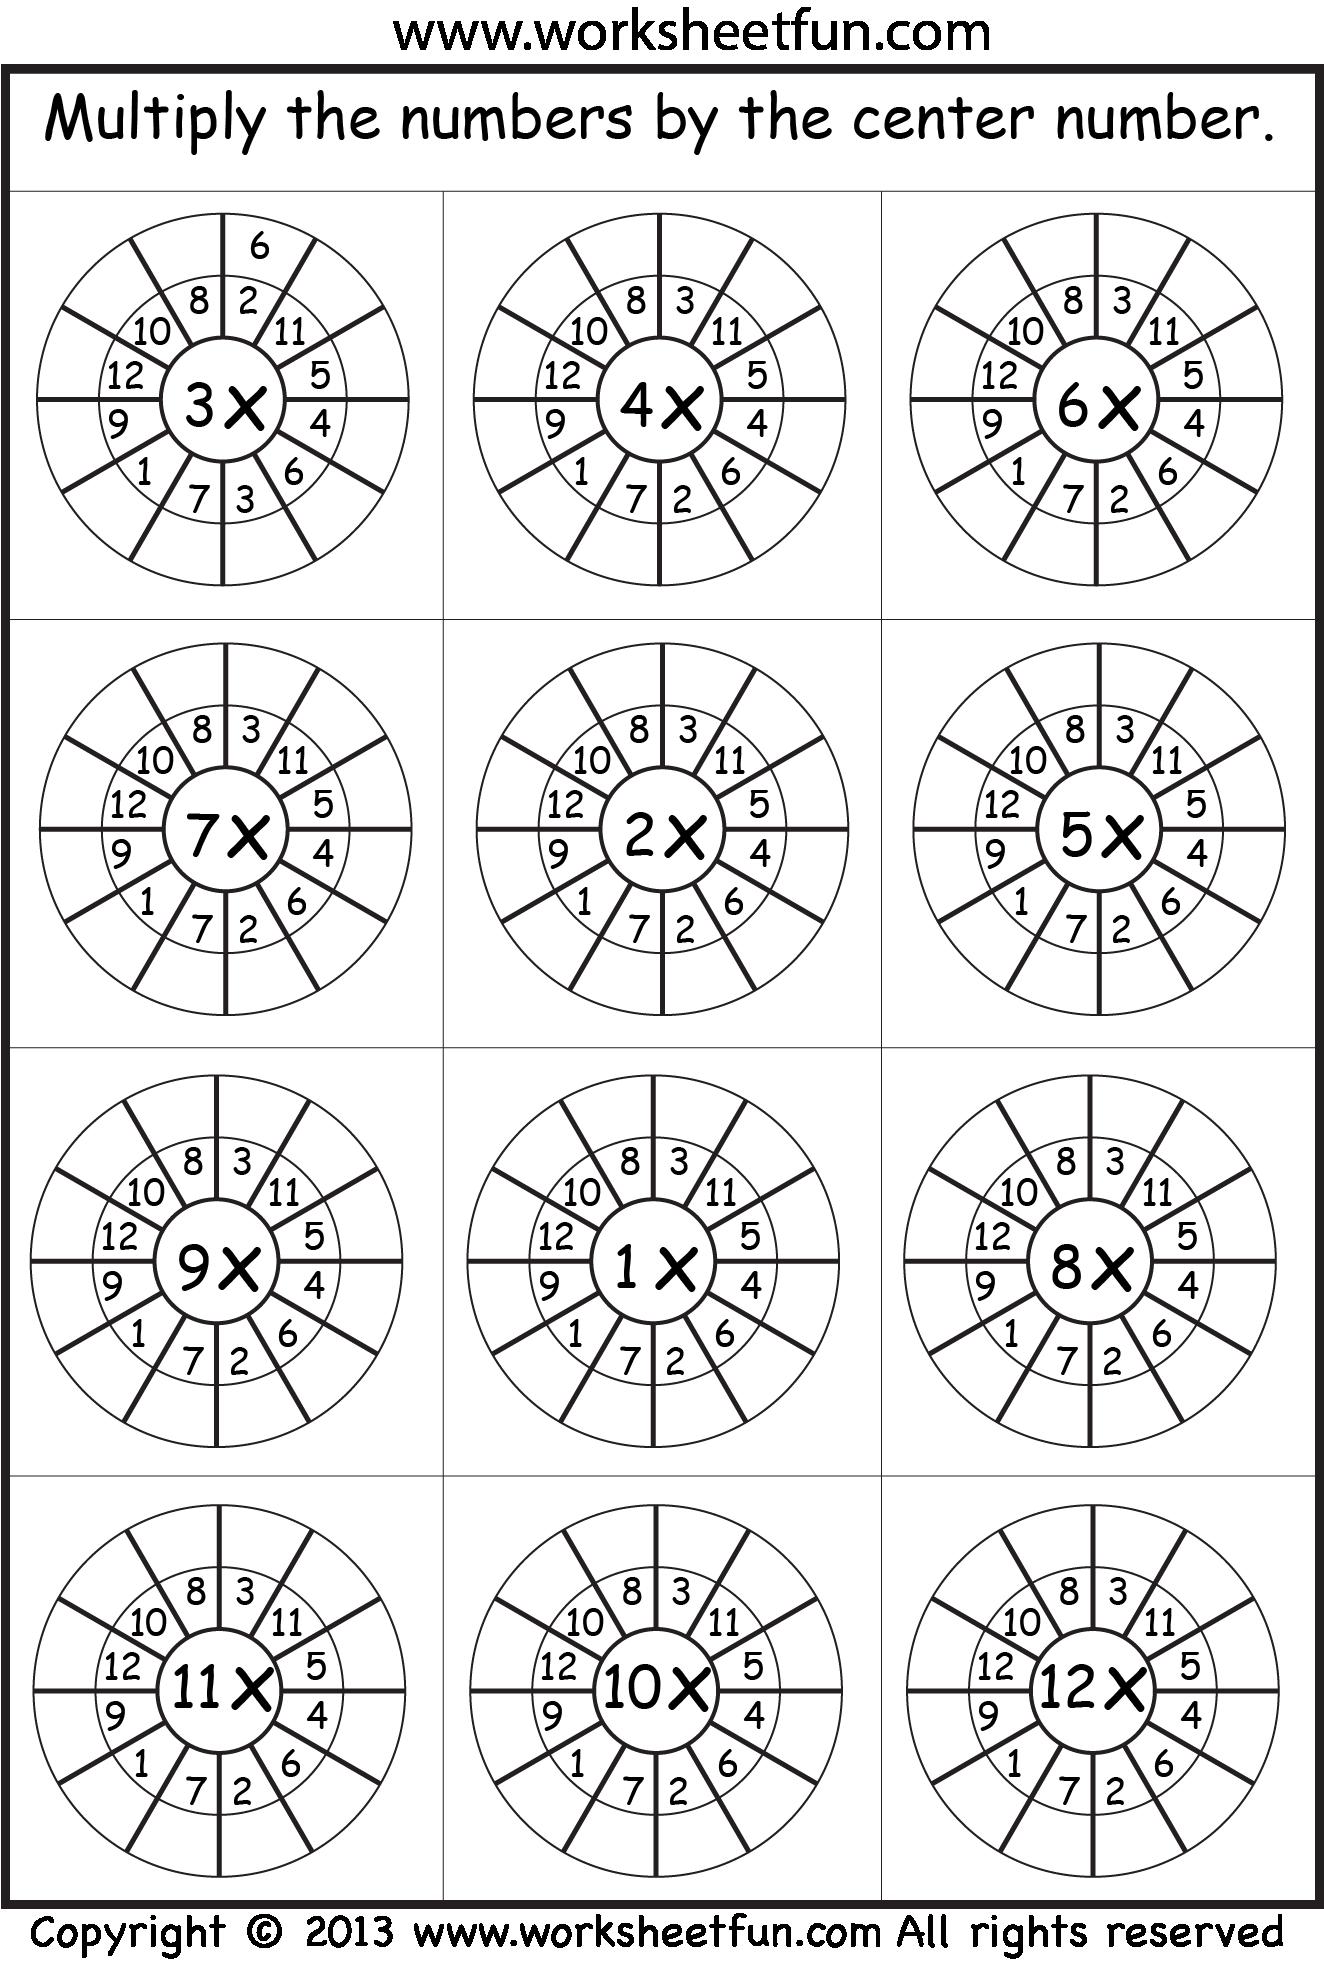 multiplication target circles with images math. Black Bedroom Furniture Sets. Home Design Ideas